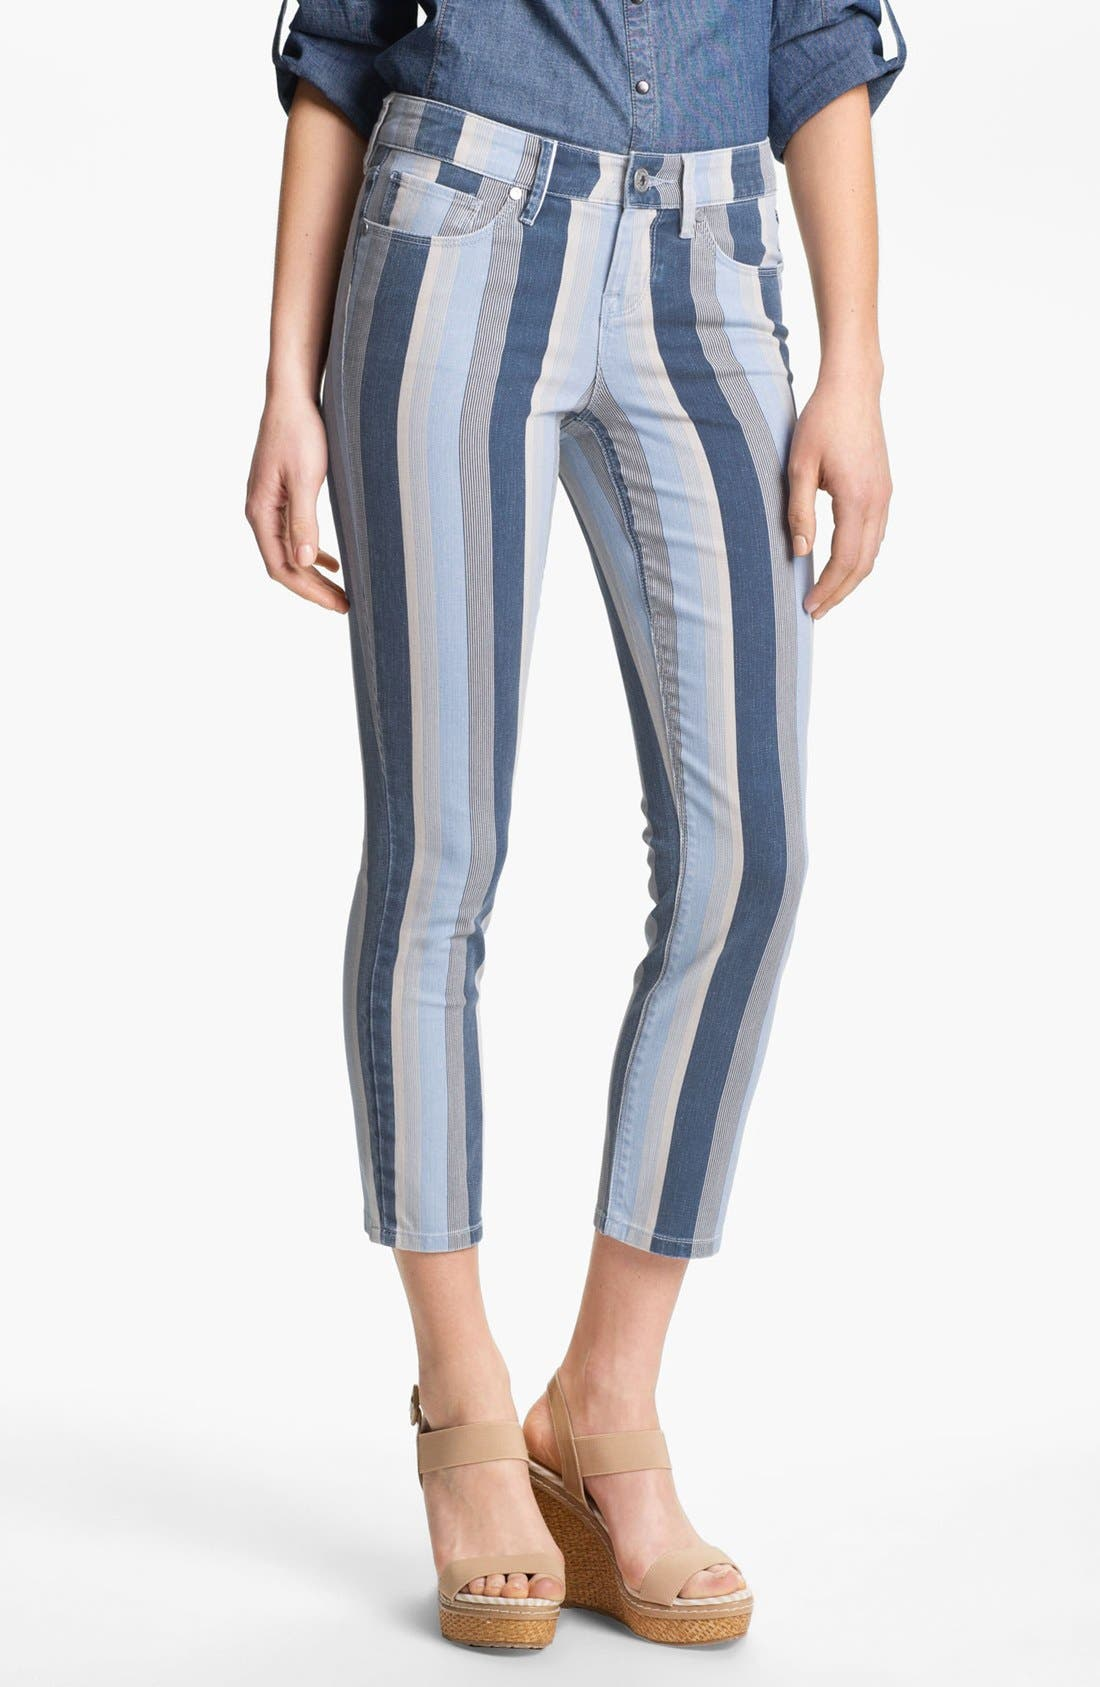 Main Image - Isaac Mizrahi Jeans 'Ali' Slim Straight Leg Jeans